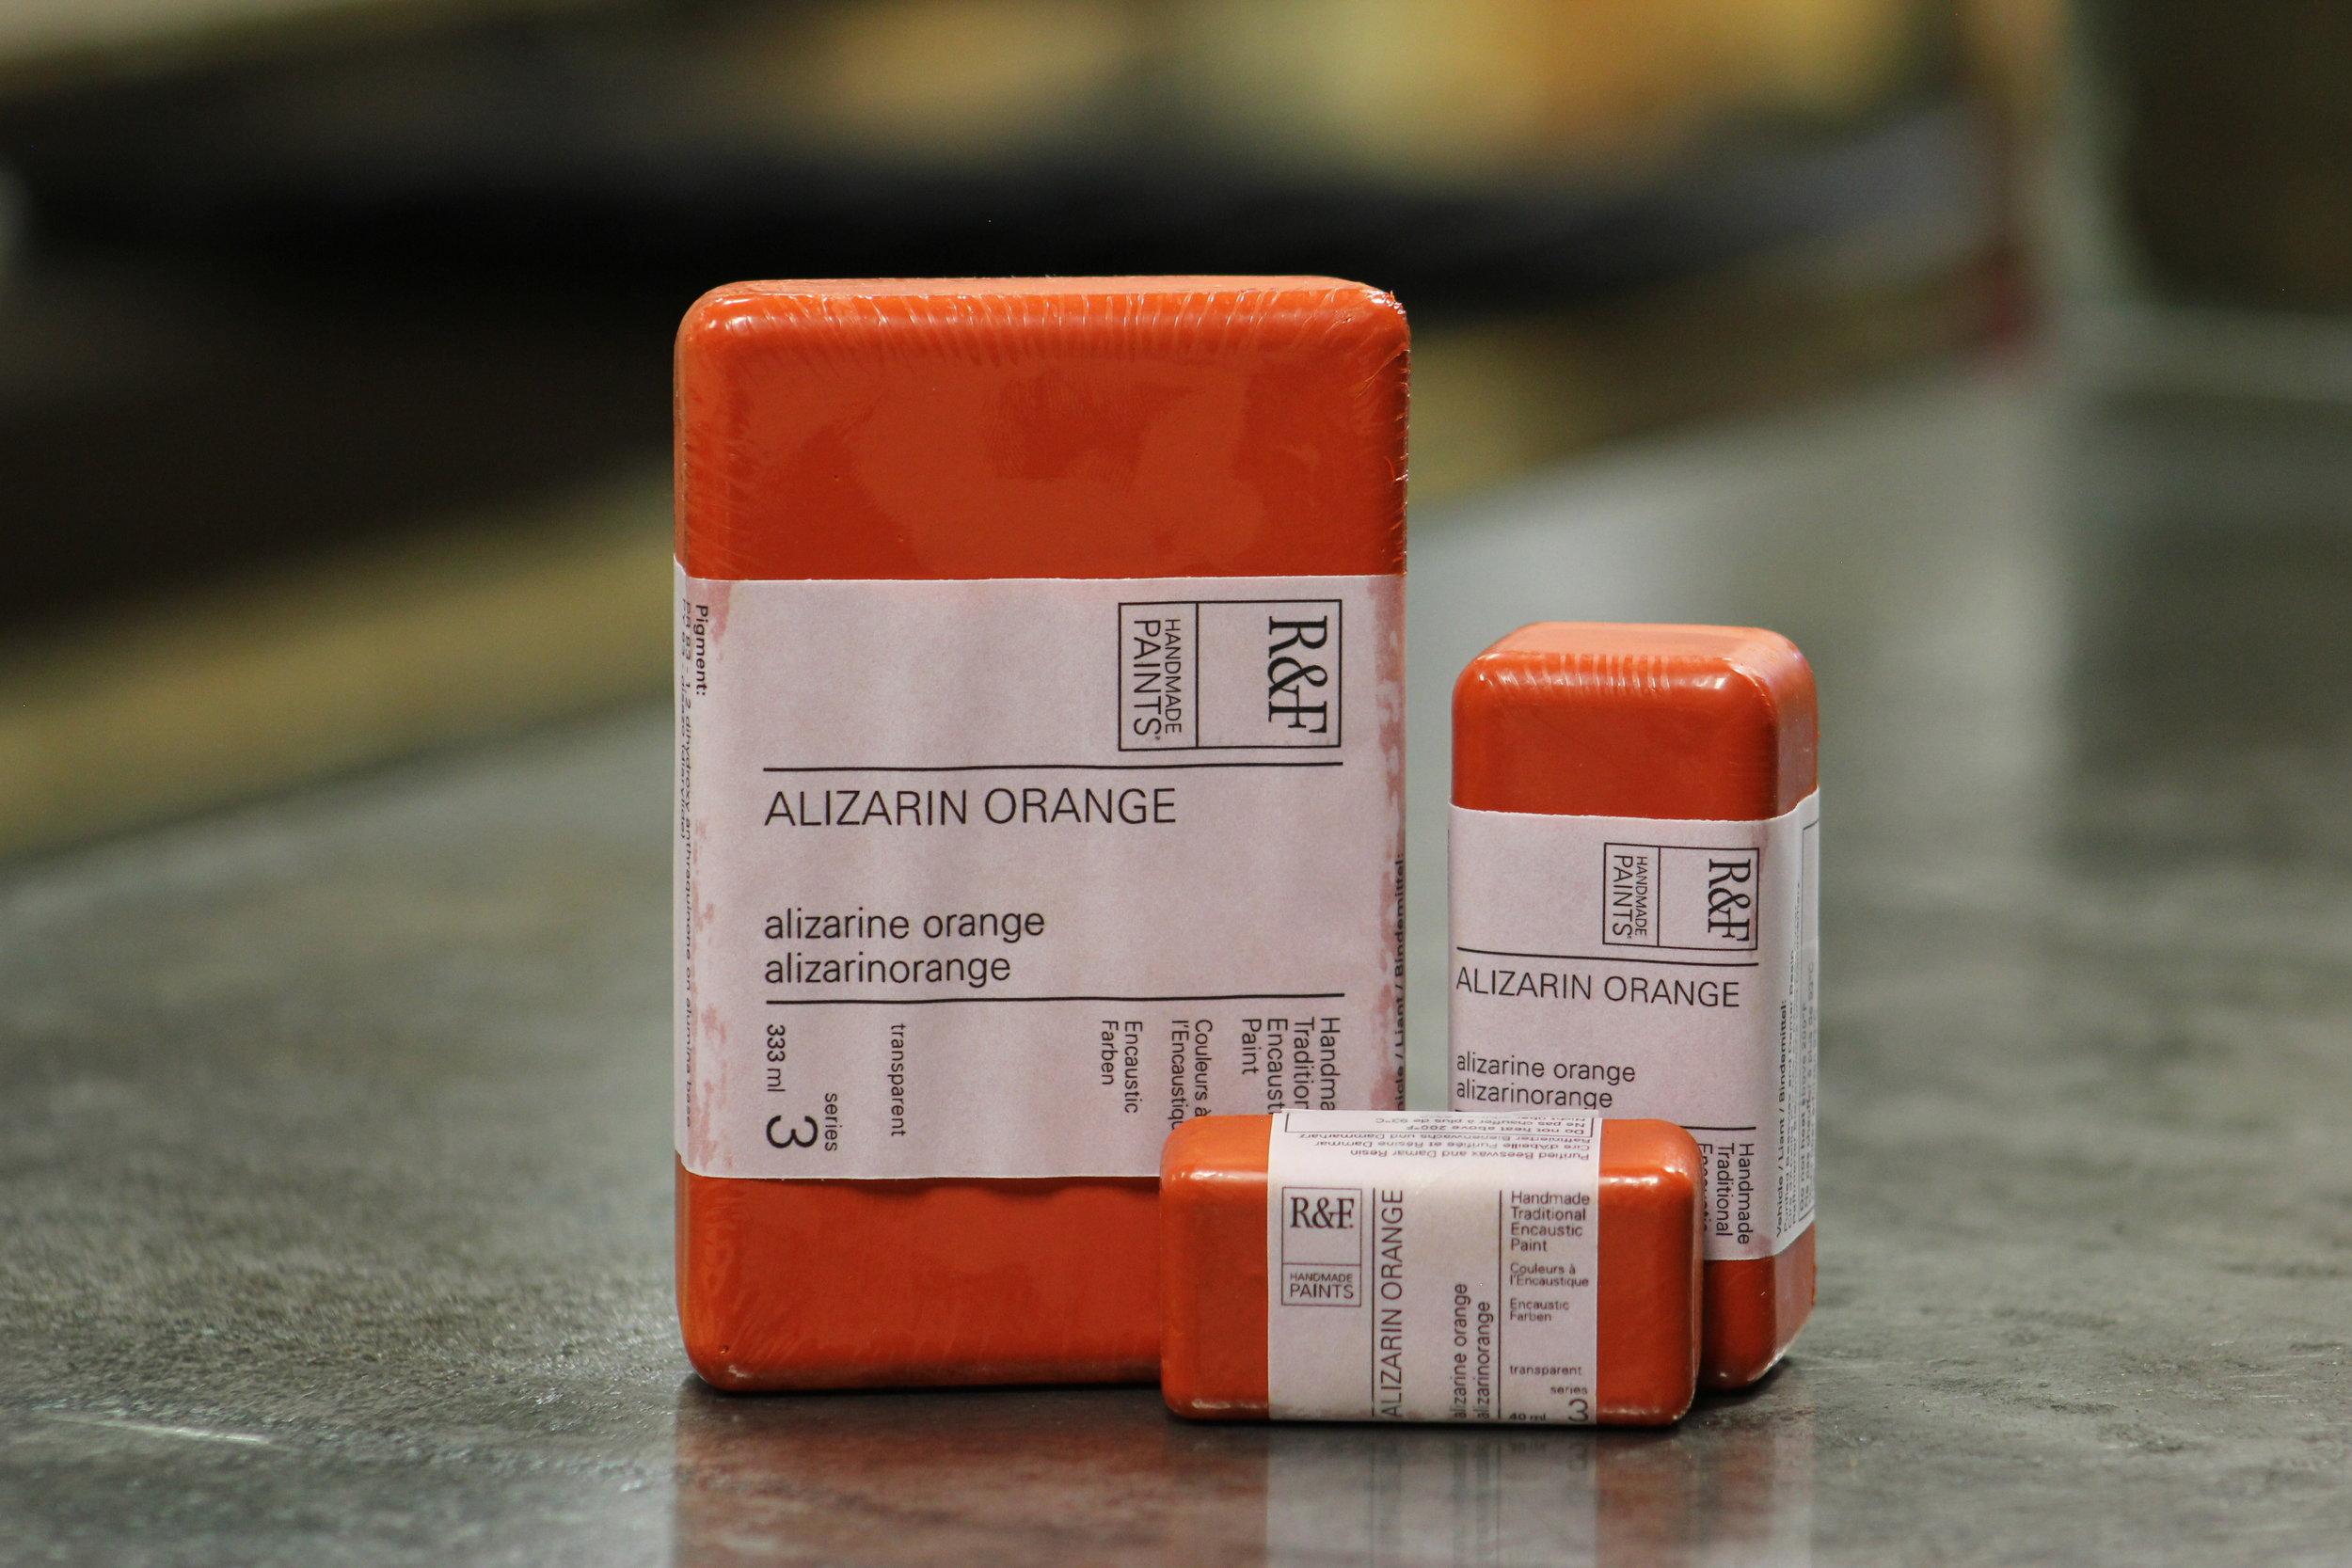 Alizarin Orange